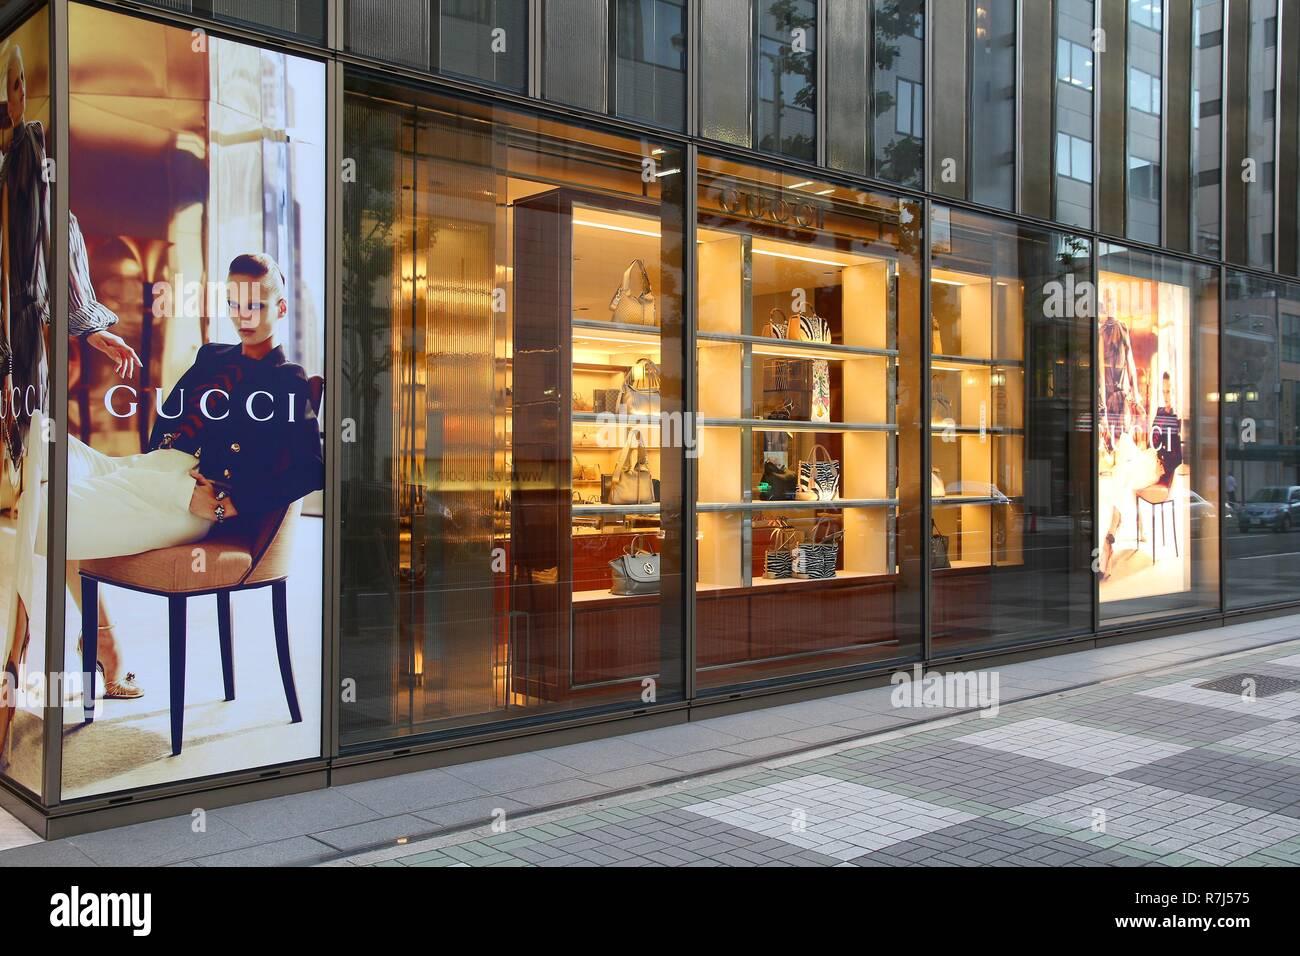 f25e3c27b10 Gucci Luxury Clothing Store Stock Photos   Gucci Luxury Clothing ...